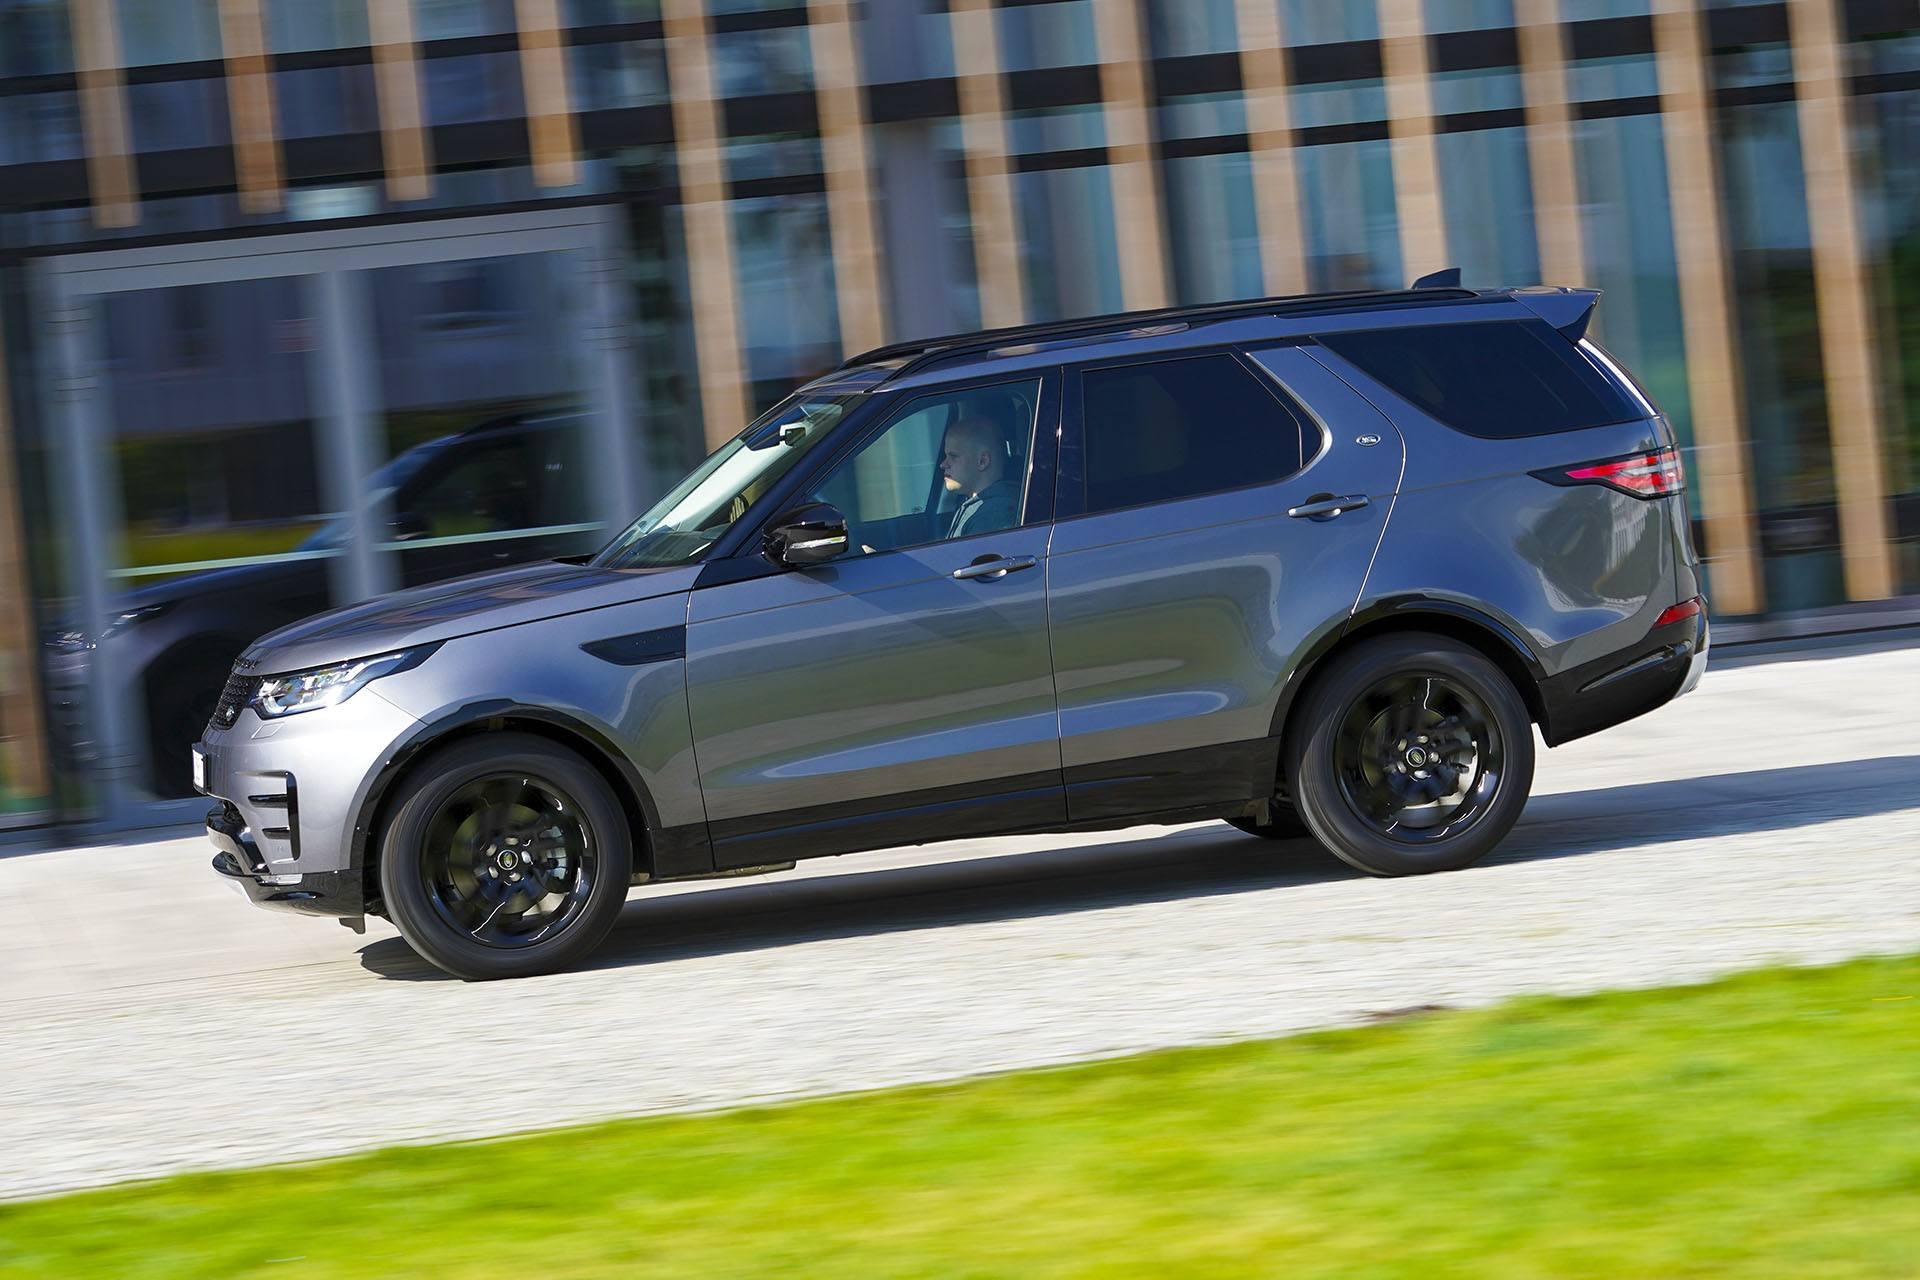 Land Rover Discovery - bok - Land Rover Discovery, Mercedes GLE, Range Rover Sport, Volkswagen Touareg, Volvo XC90 – PORÓWNANIE –opinie, dane techniczne, wymiary